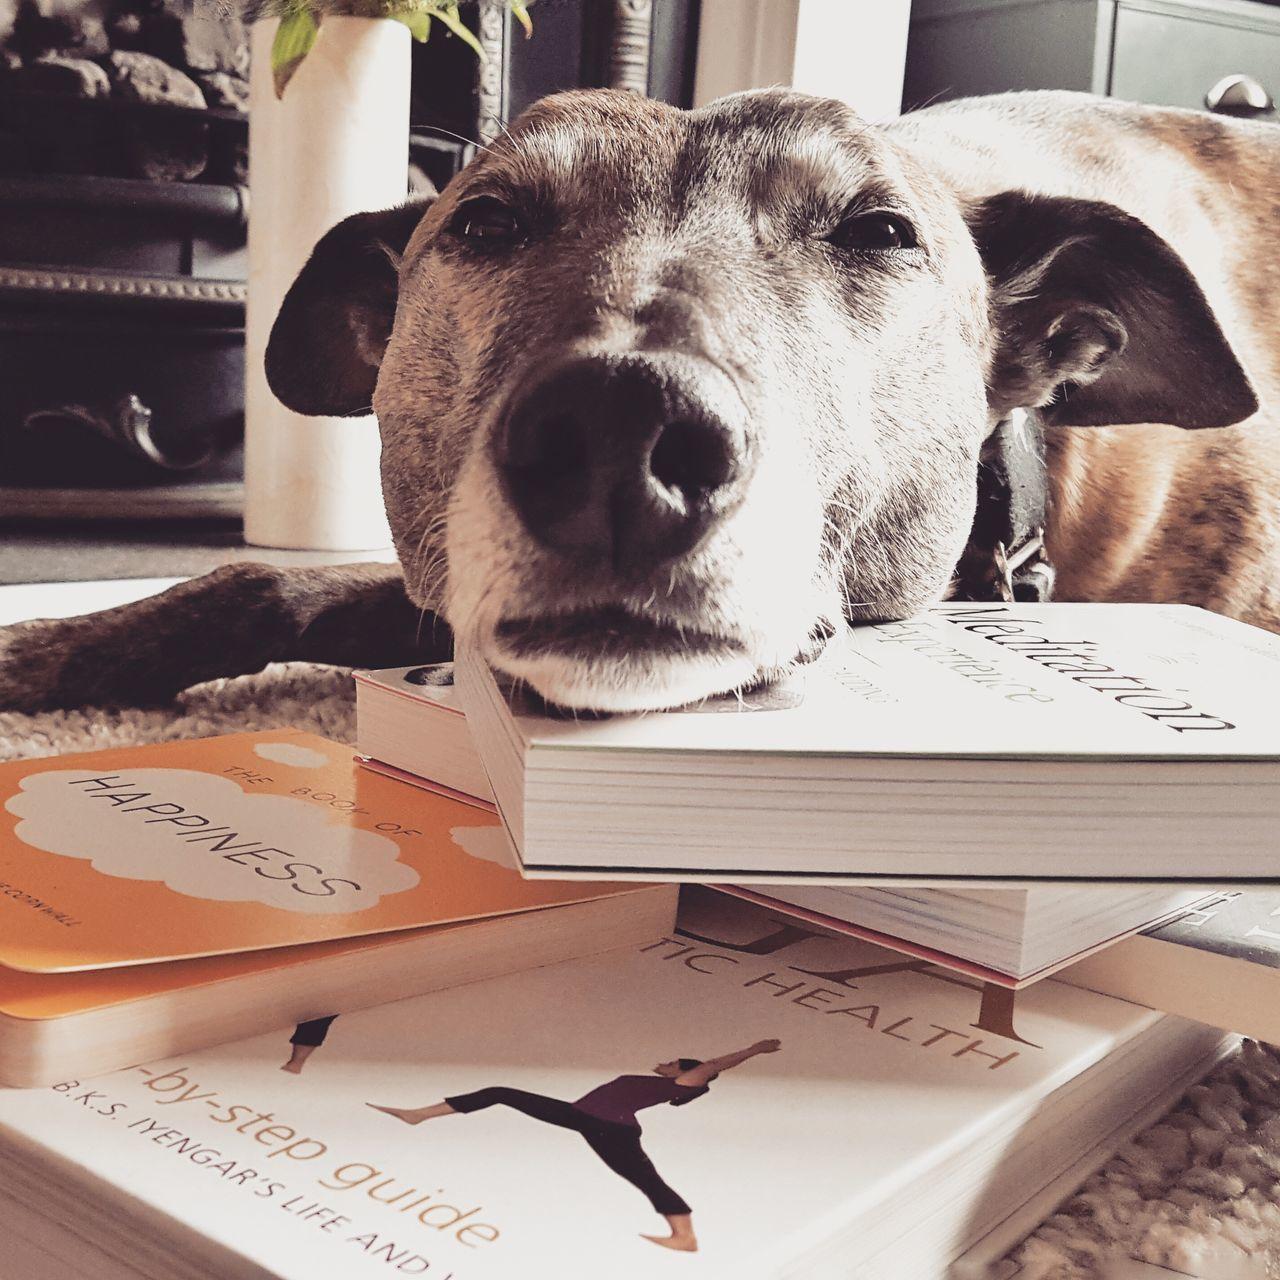 my dog ned resting Dog Dogslife Dog Sleeping  Dogrelaxing Lurcher Bull Lurcher Meditation Books Yoga Books